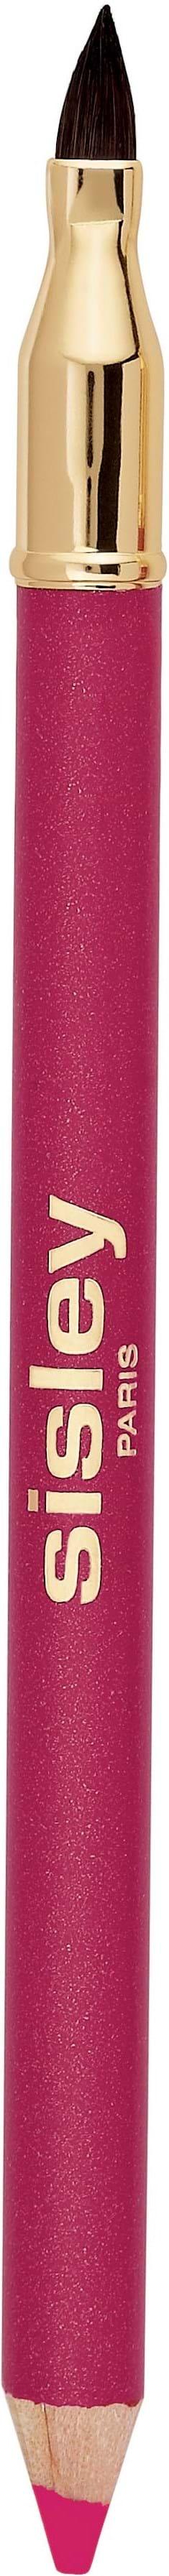 Sisley Phyto-Levres Perfect Lipliner N° 9 Fushia